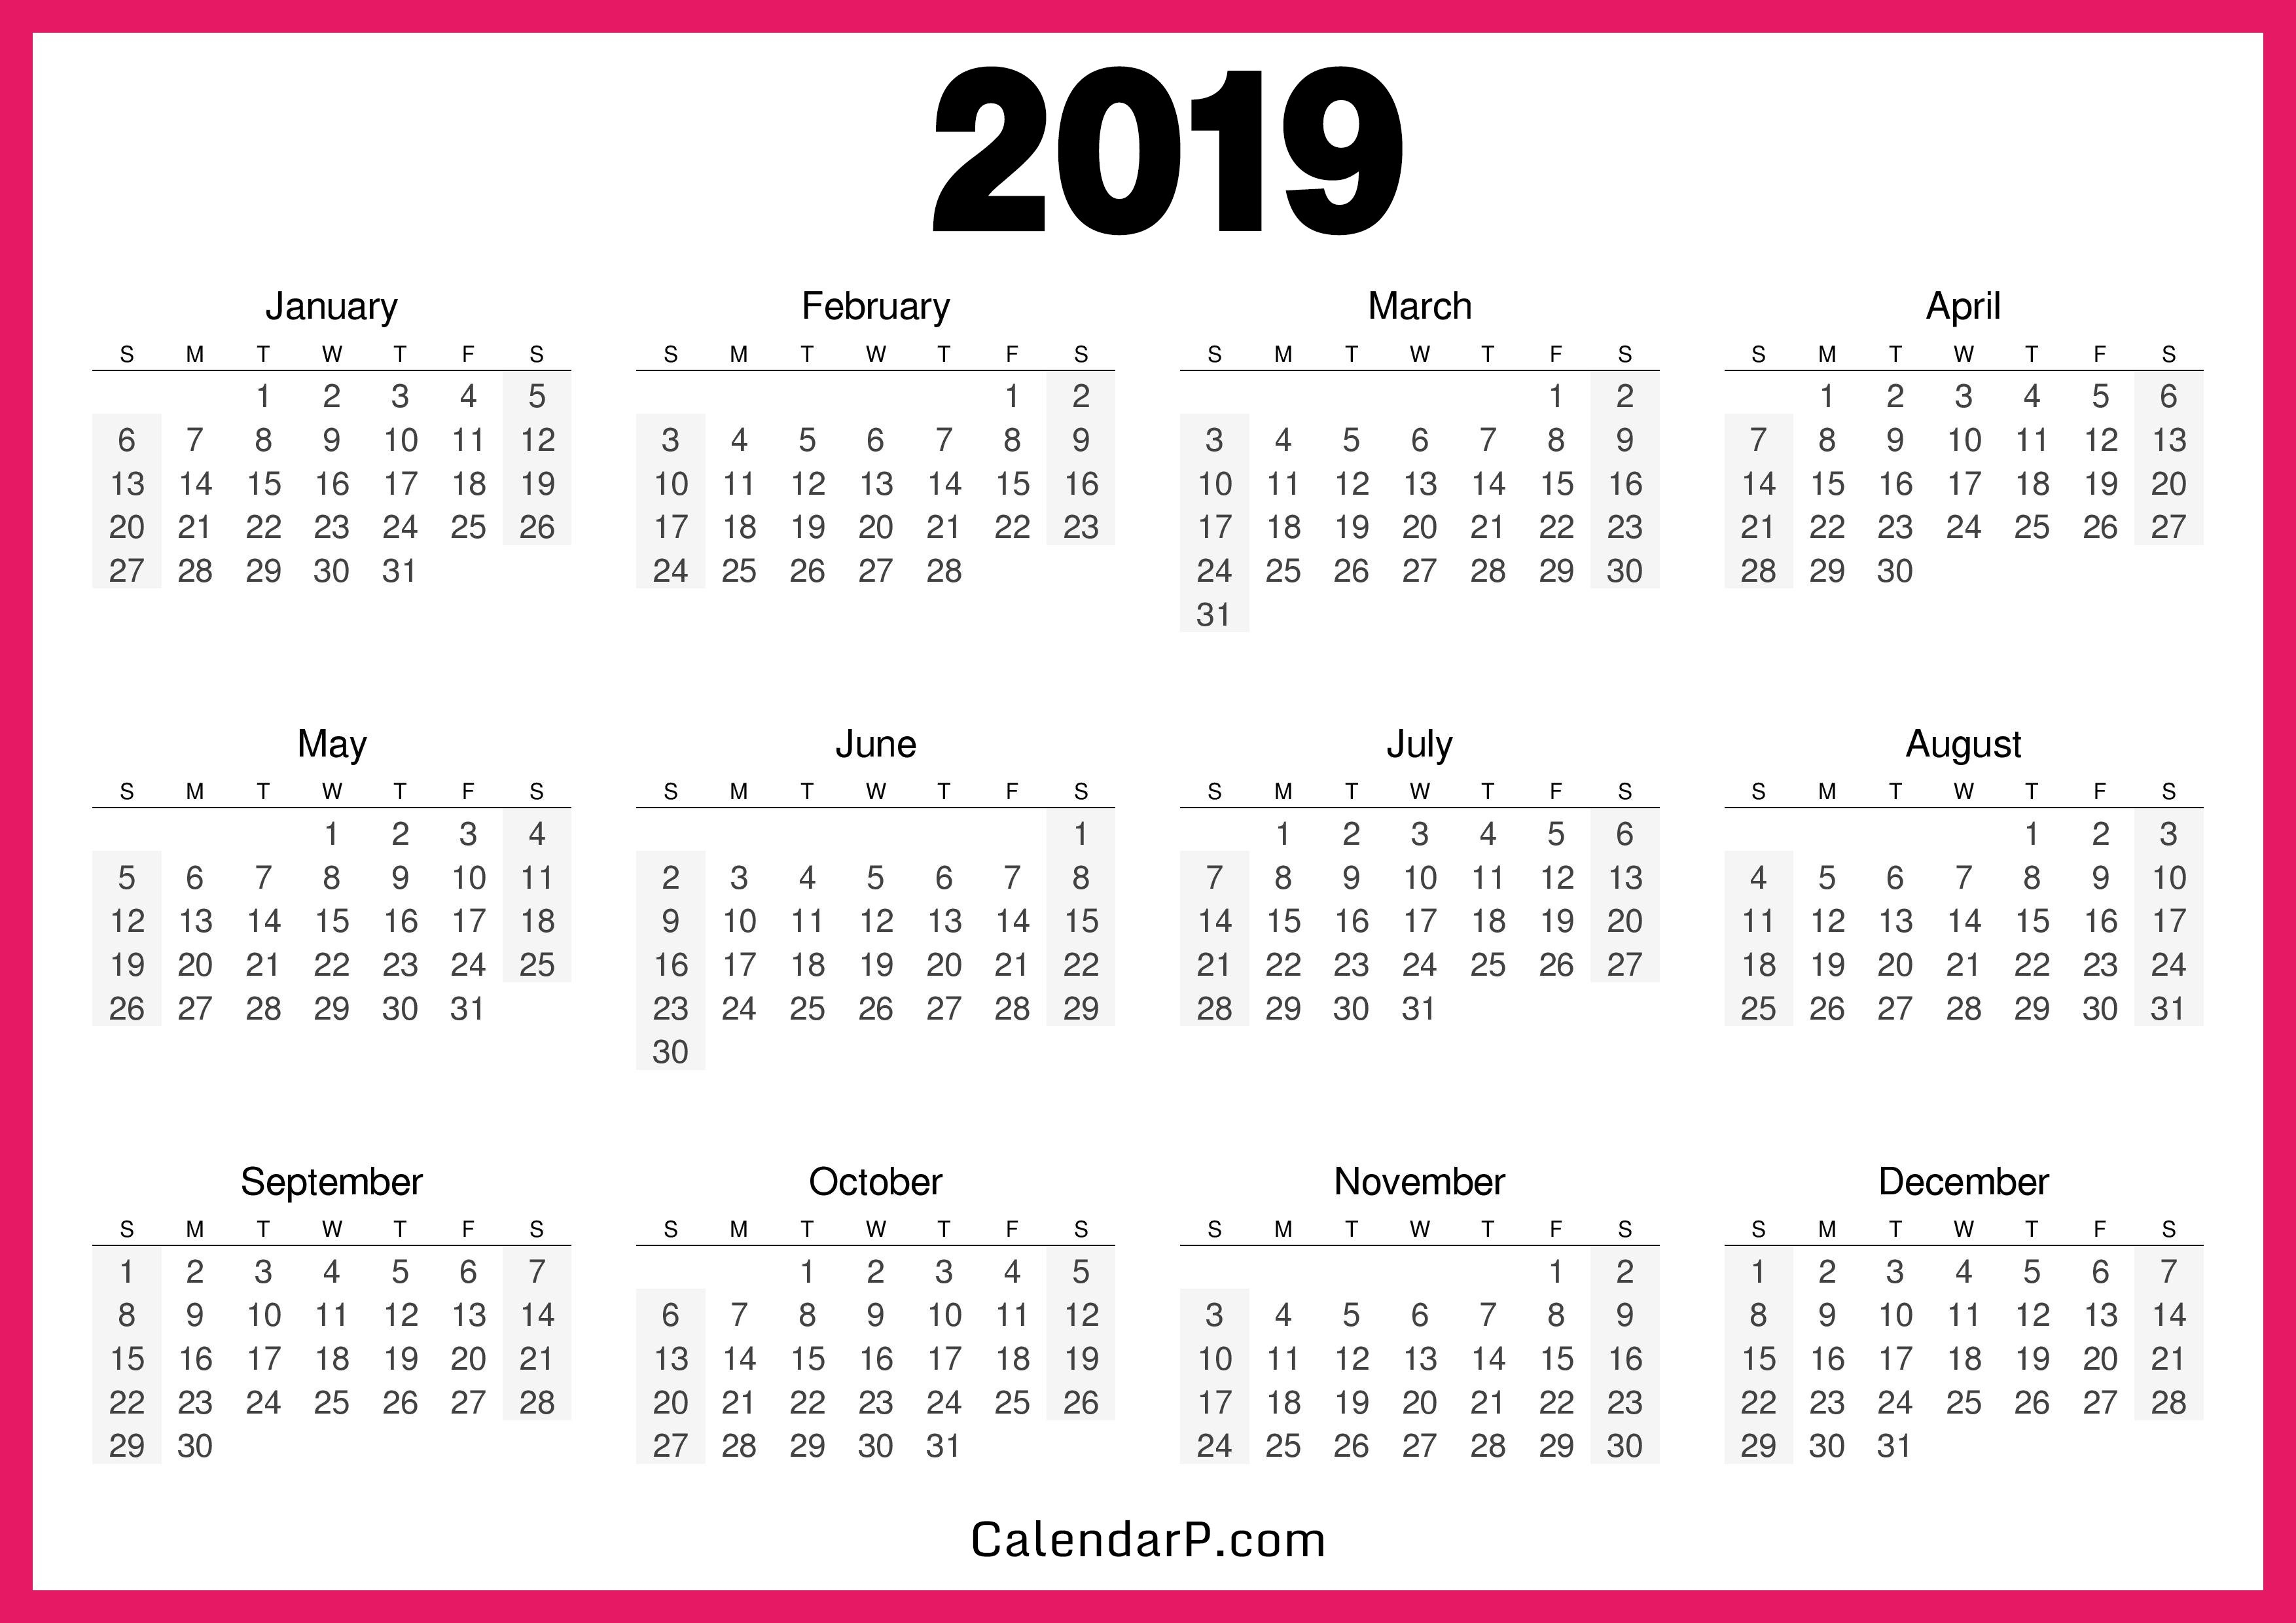 Printable 2019 Calendar Free Hd, Pink – Calendarp | Printable 2019 Calendar 8 1/2 X 11